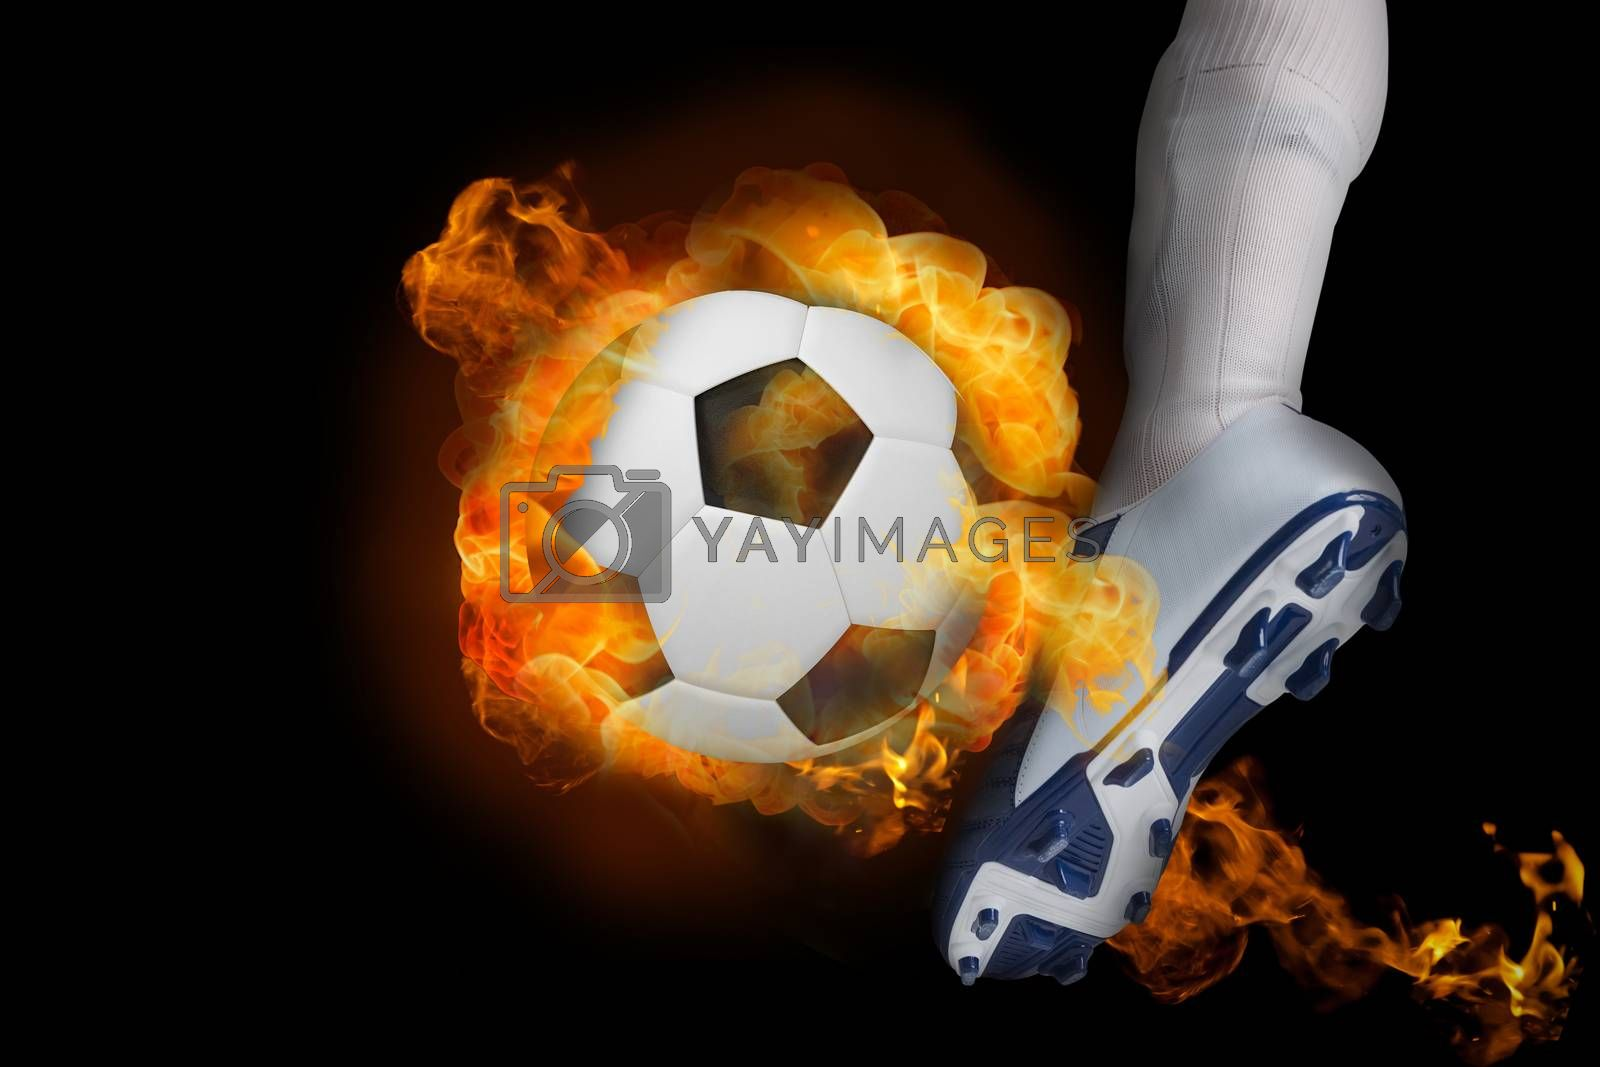 Football player kicking flaming ball by Wavebreakmedia